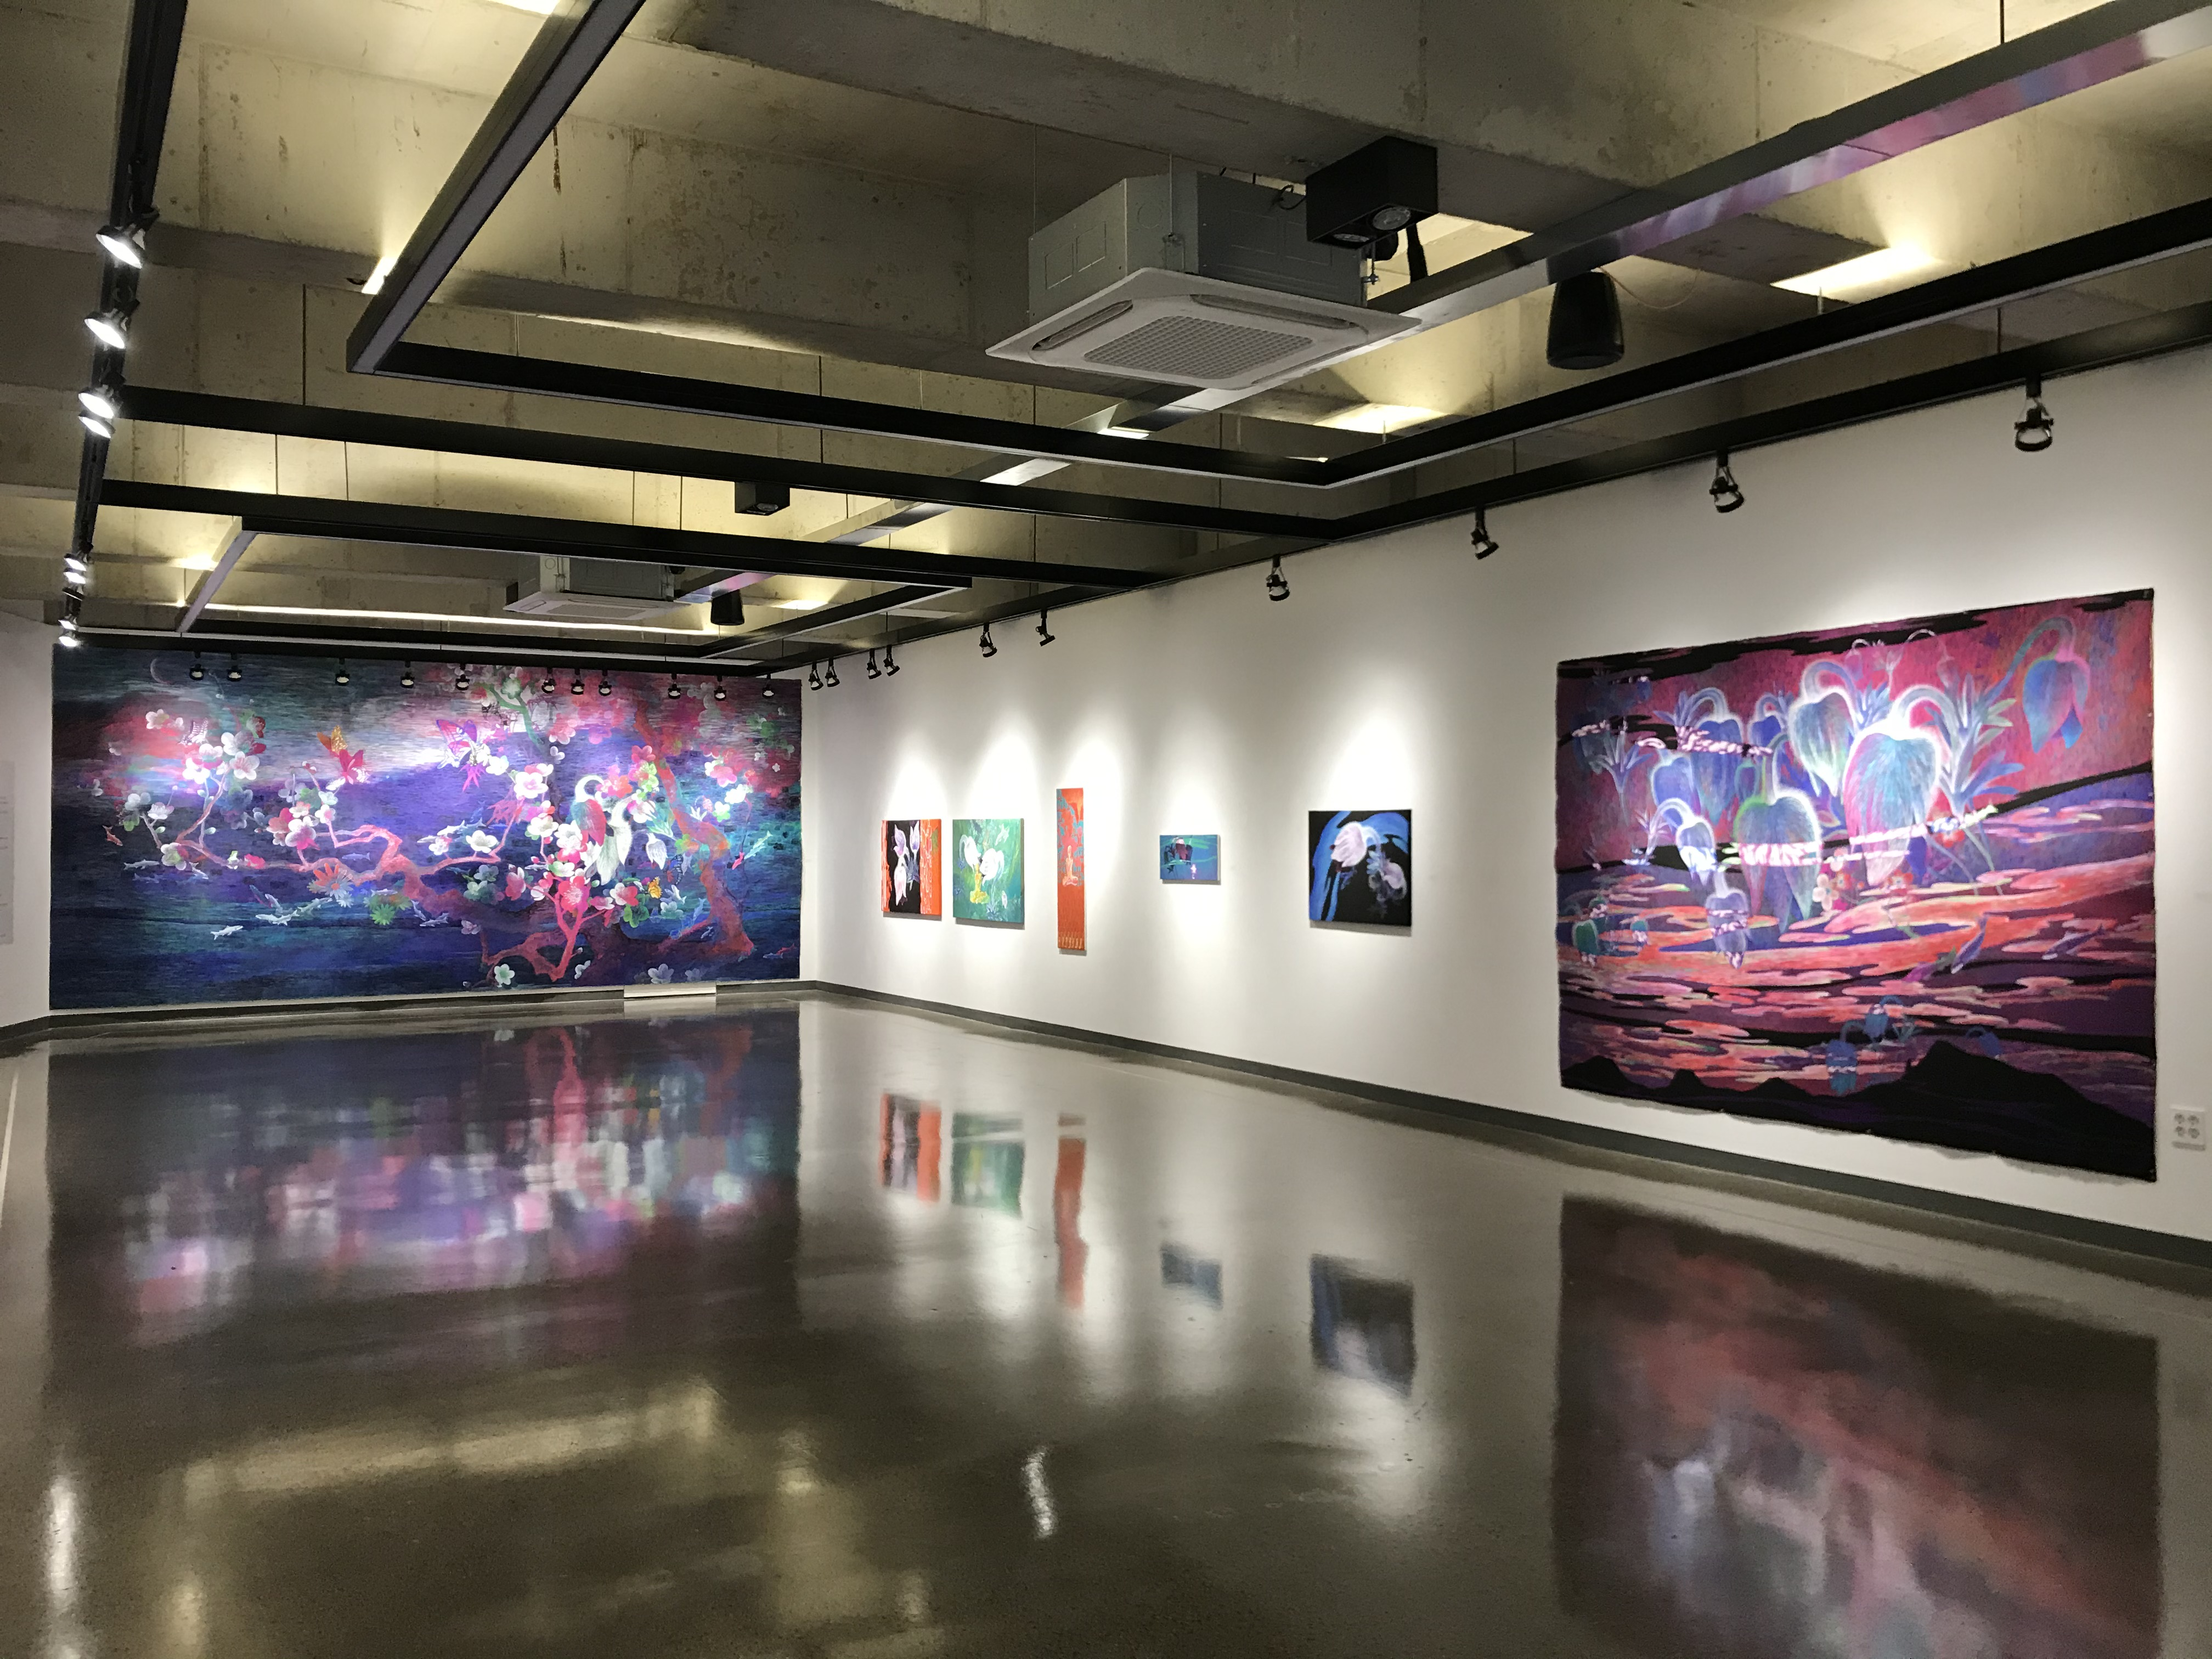 http://deyoungmuseum.co.kr/bs/se2/imgup/1590221258KakaoTalk_20200523_152247211.jpg